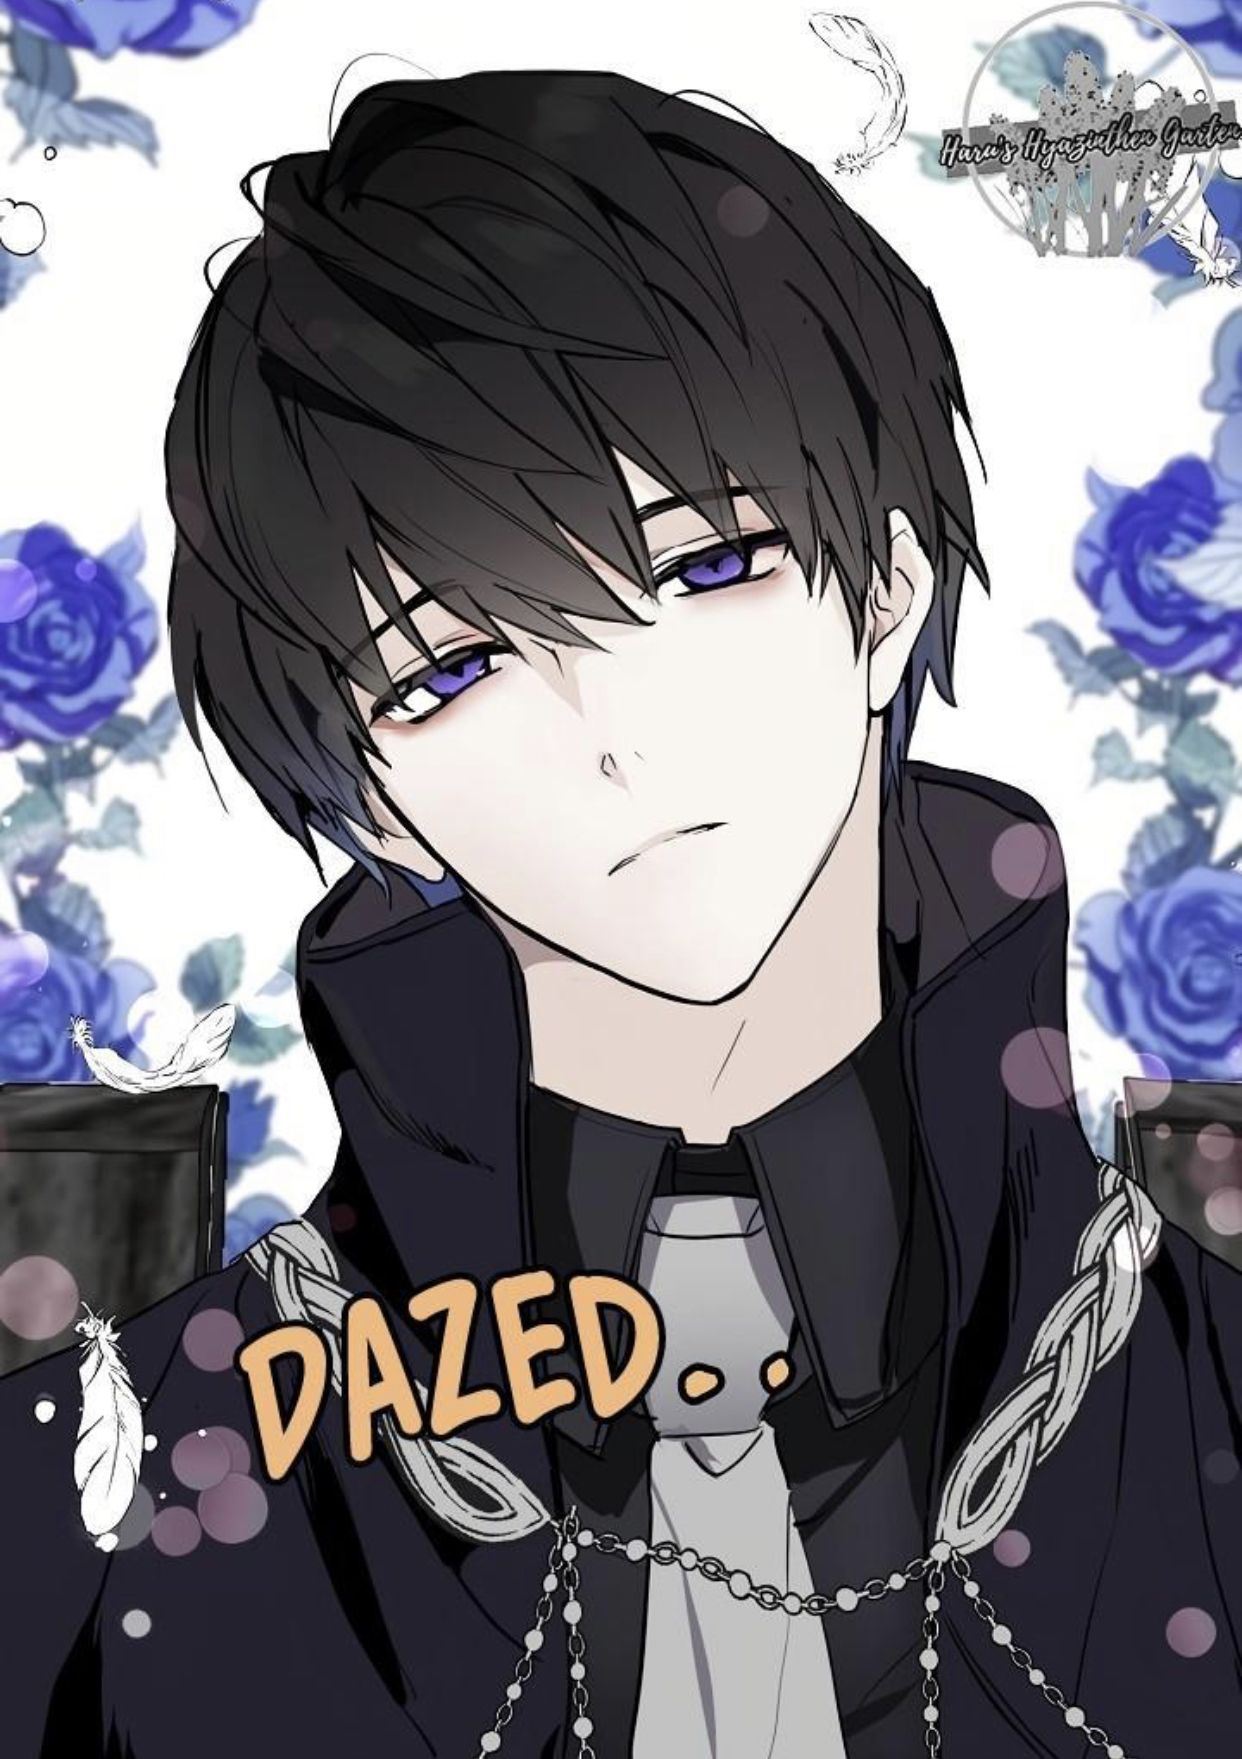 A False Confession Manga에 있는 Animemangaluver님의 핀 2020